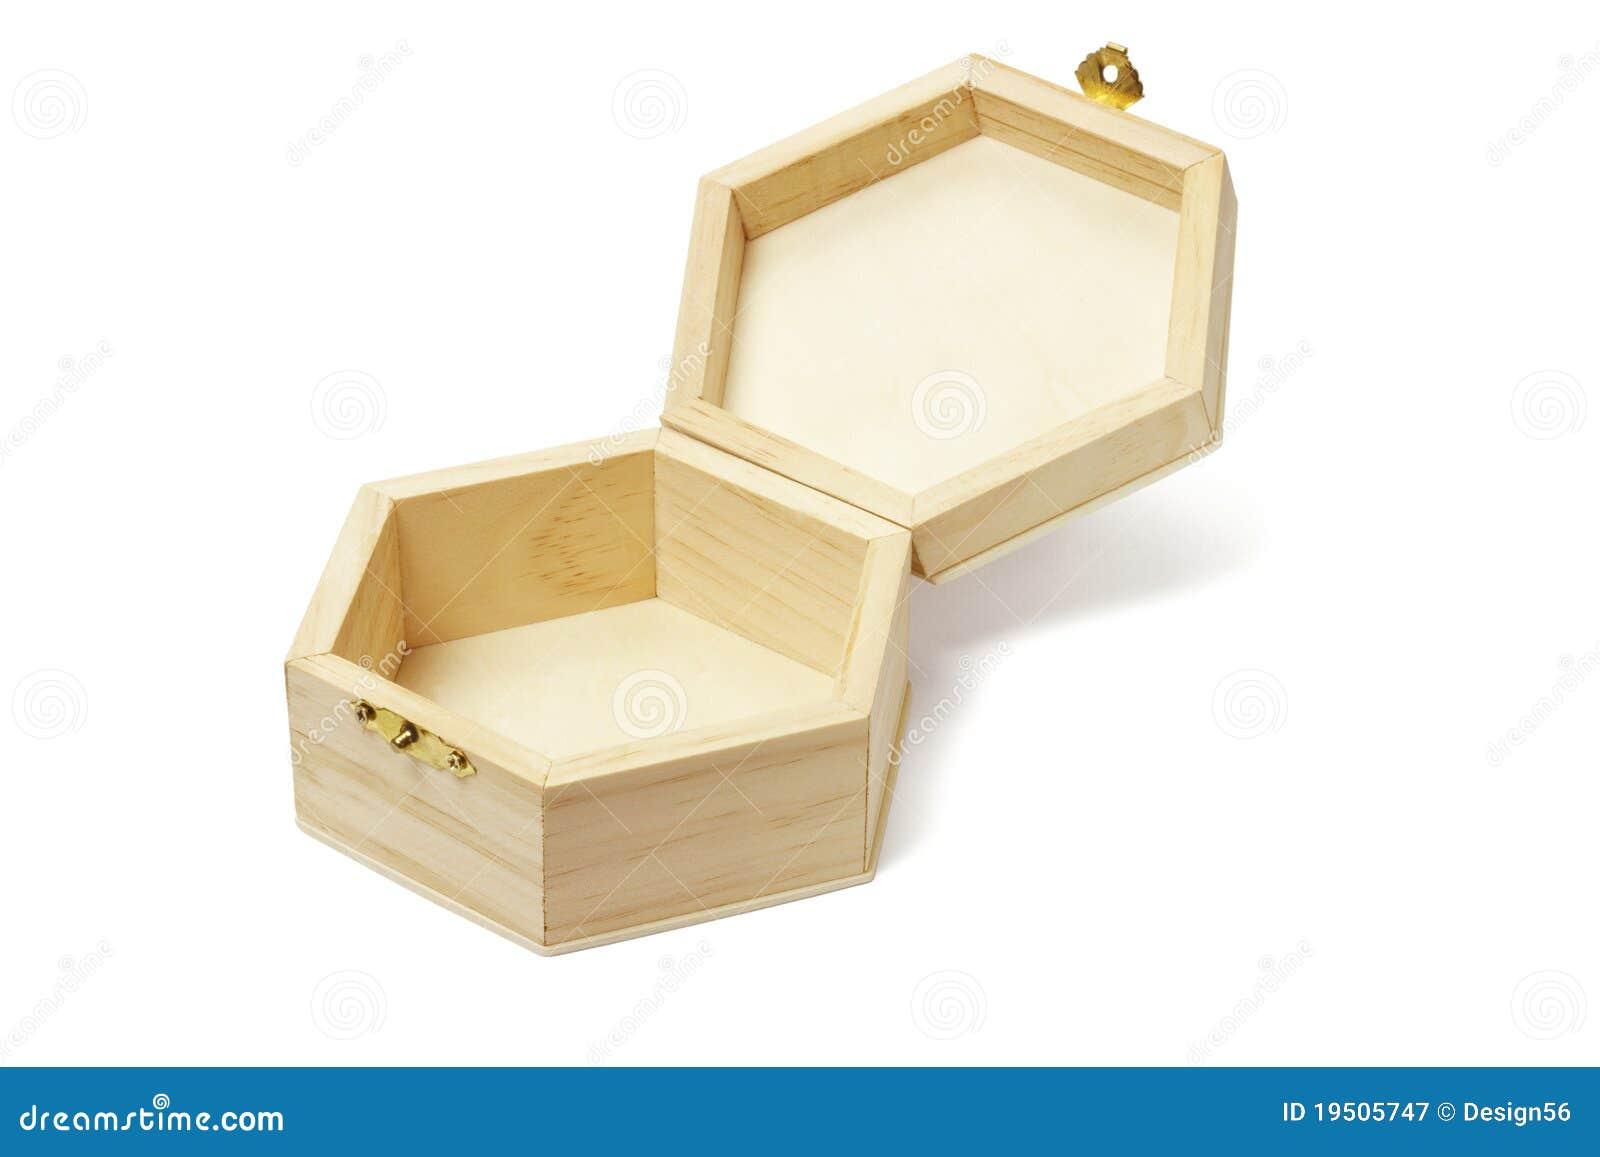 ... Free Stock Photography: Empty wooden hexagonal shape storage box